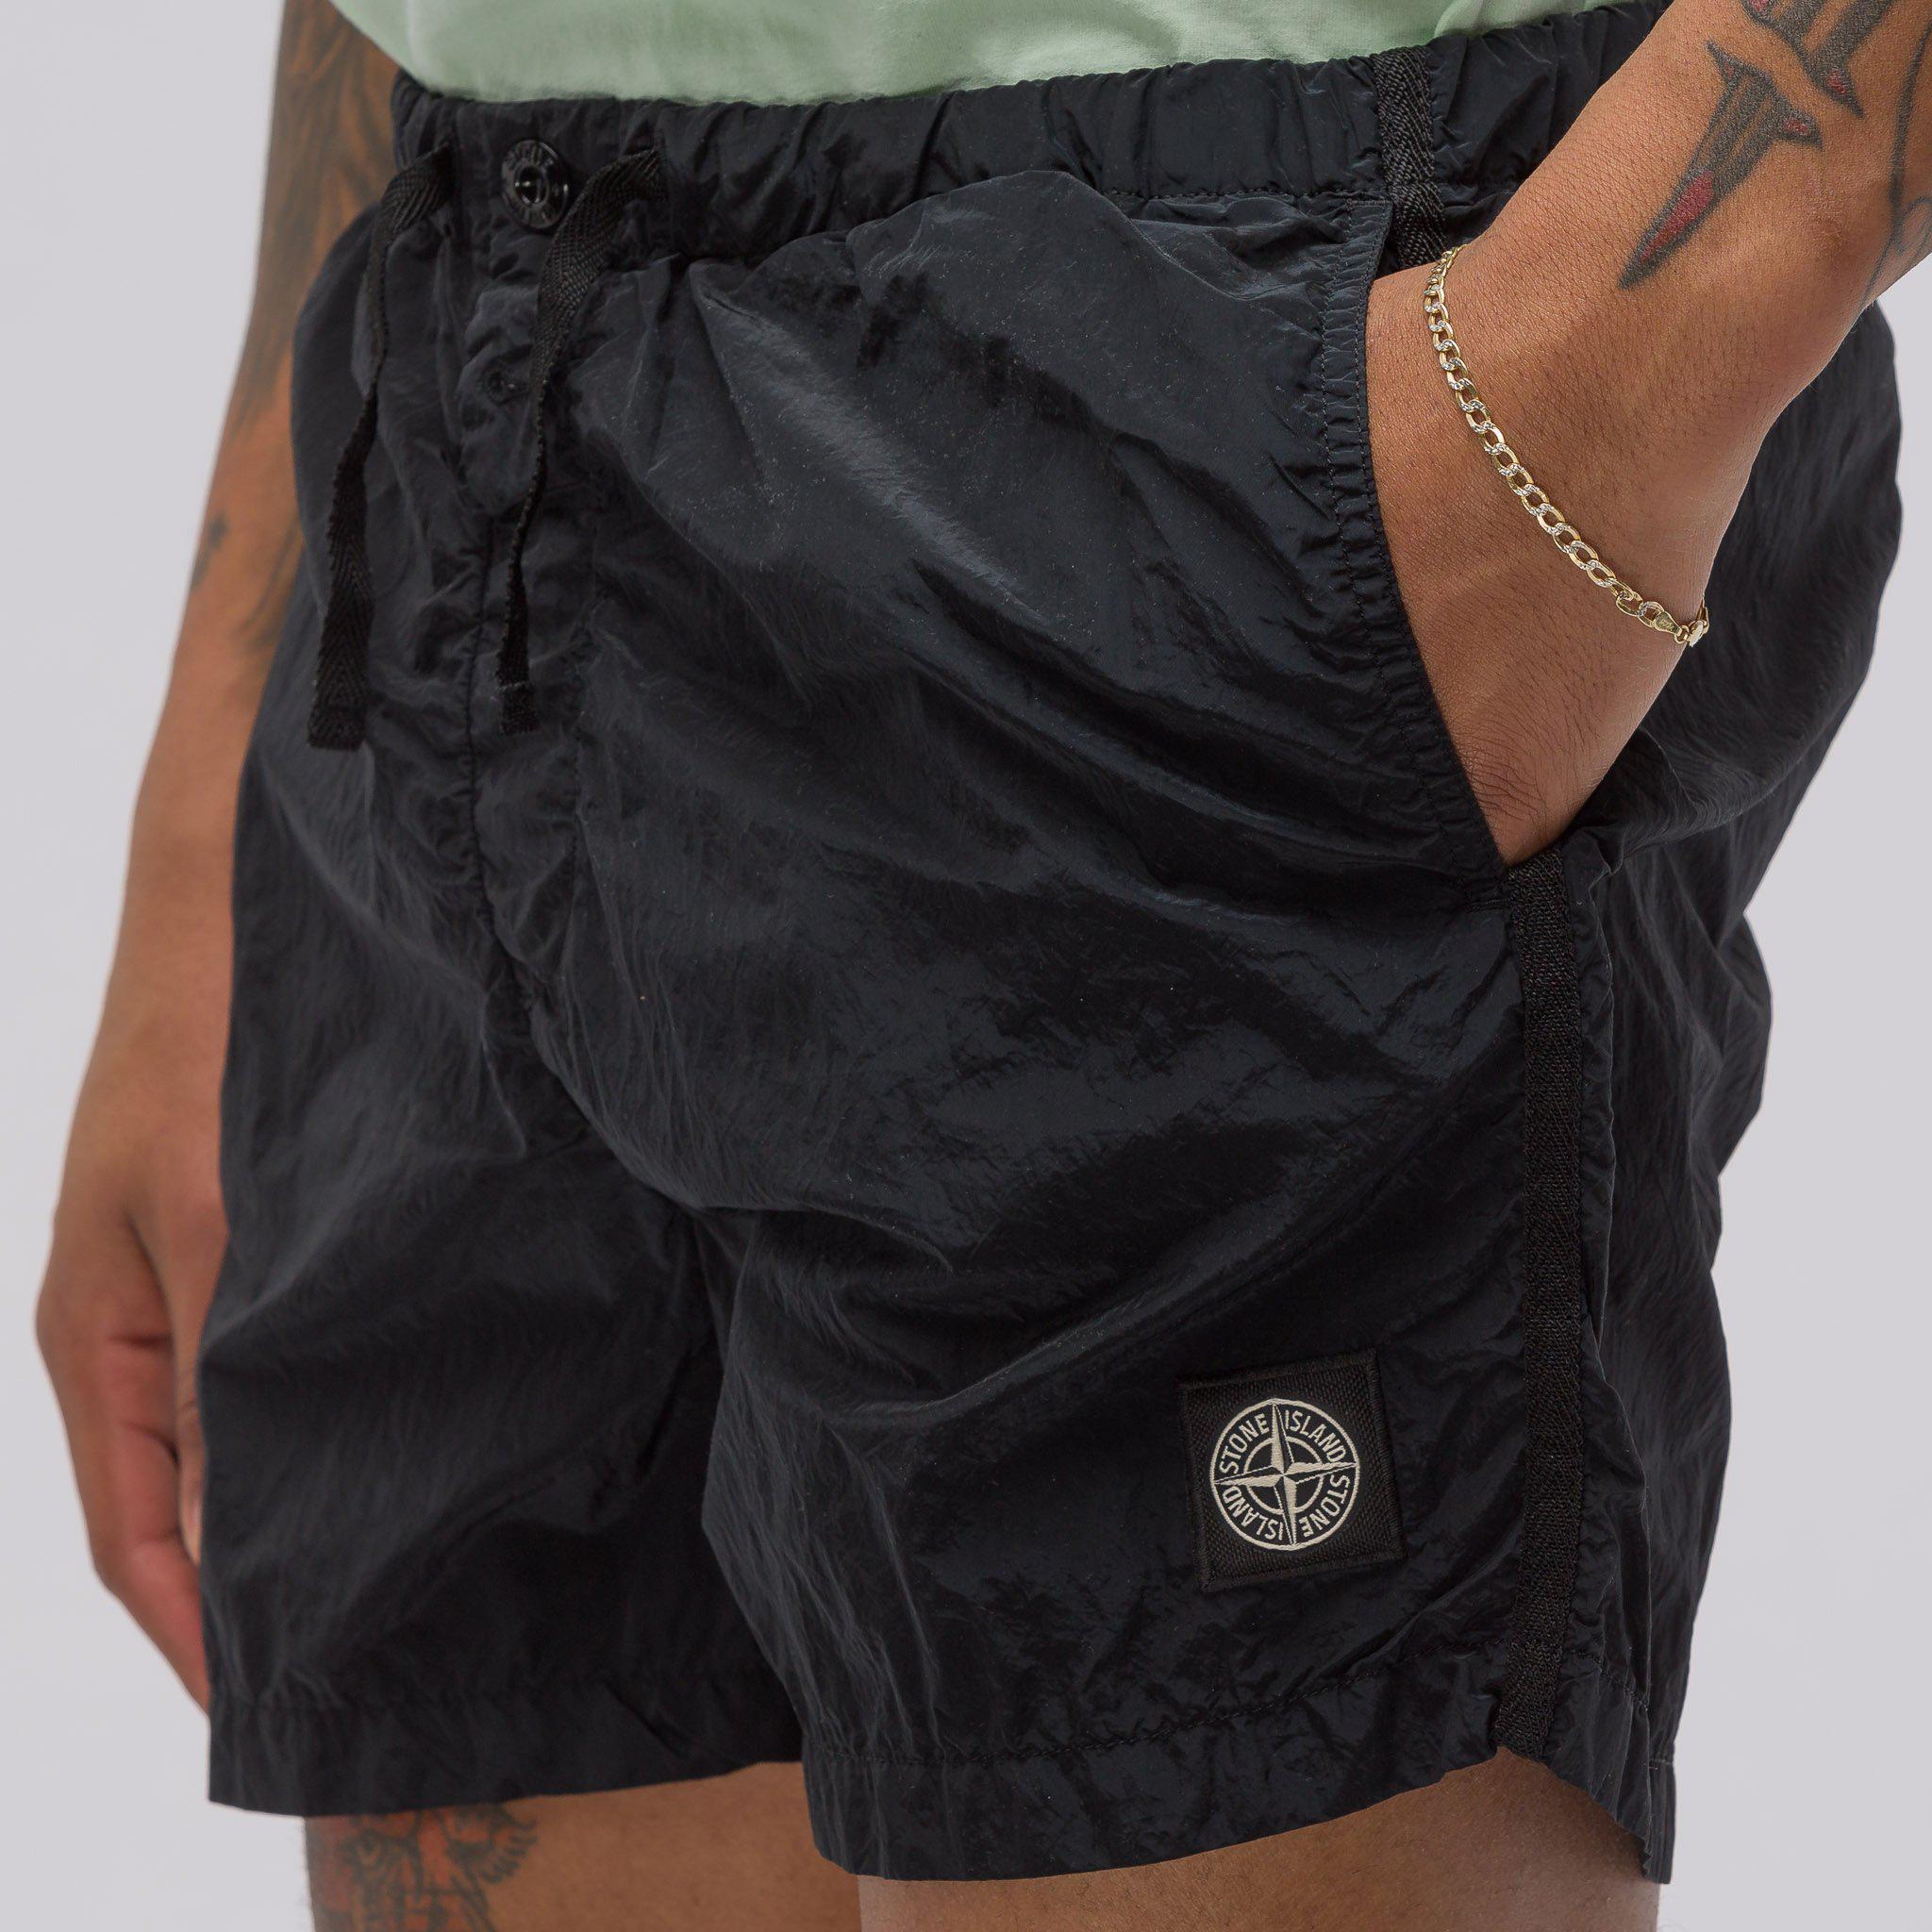 2d8c26d727 Stone Island B0643 Shorts In Black in Black for Men - Lyst